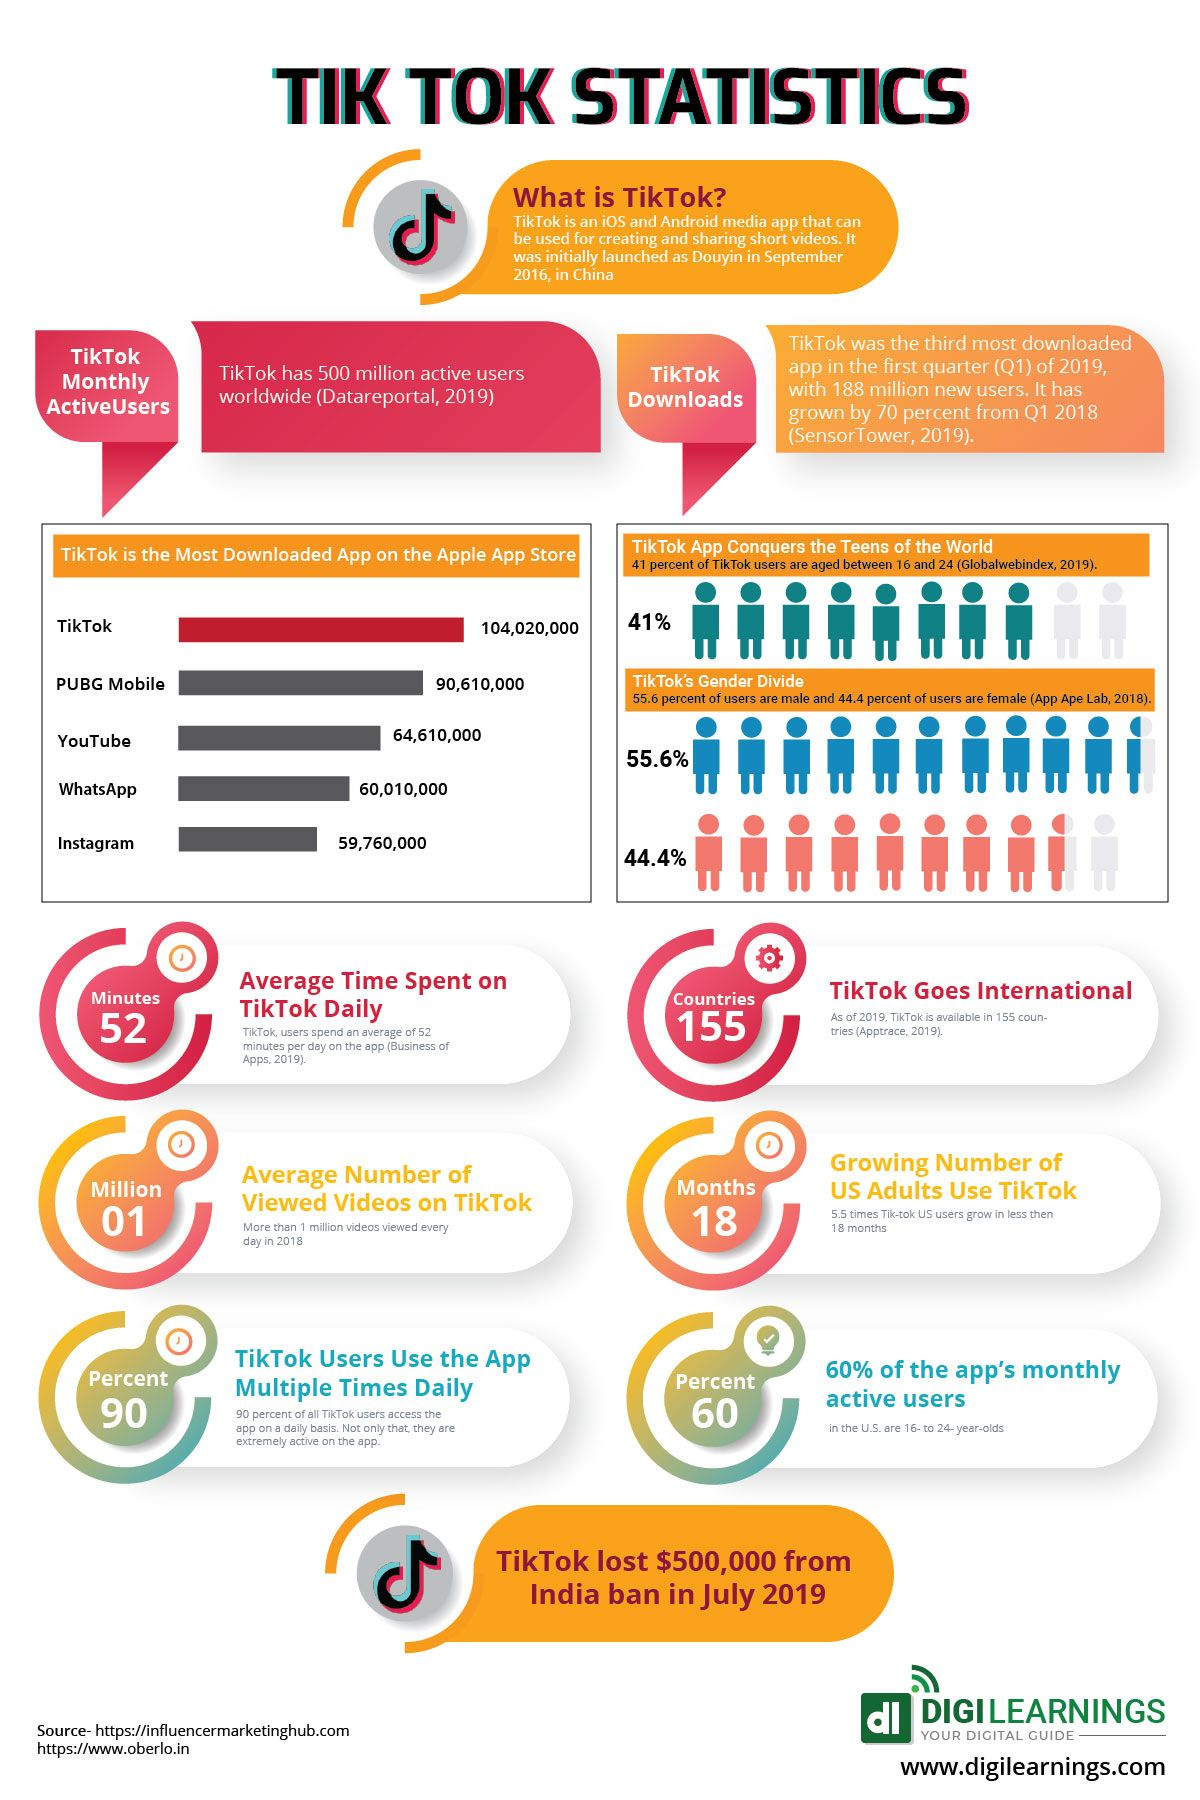 Tik Tok Statistics 2020 Infographic Marketing Strategy Social Media Social Media Marketing Business Digital Marketing